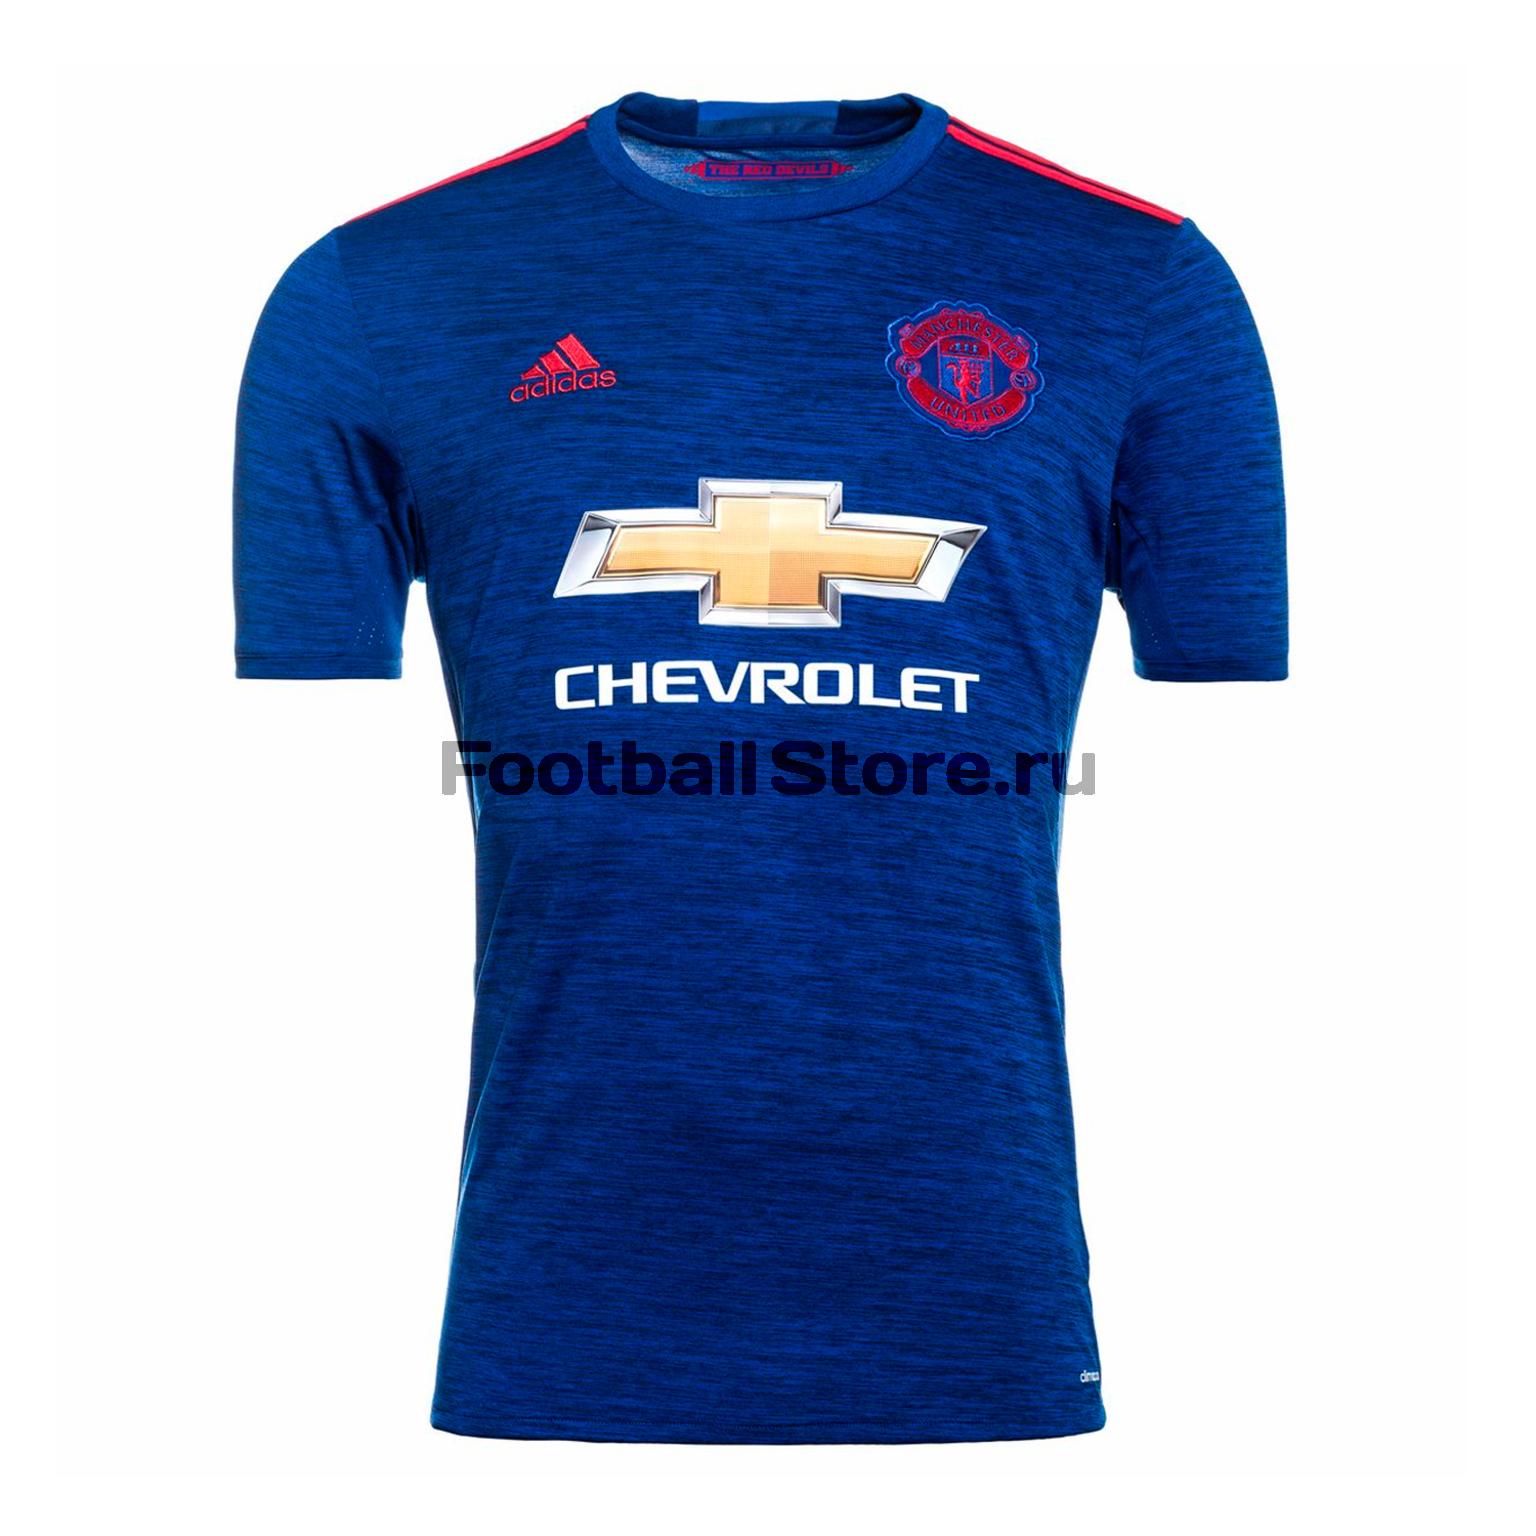 Manchester United Adidas Футболка игровая Adidas Away Manchester United AI6704 adidas футболка russia away